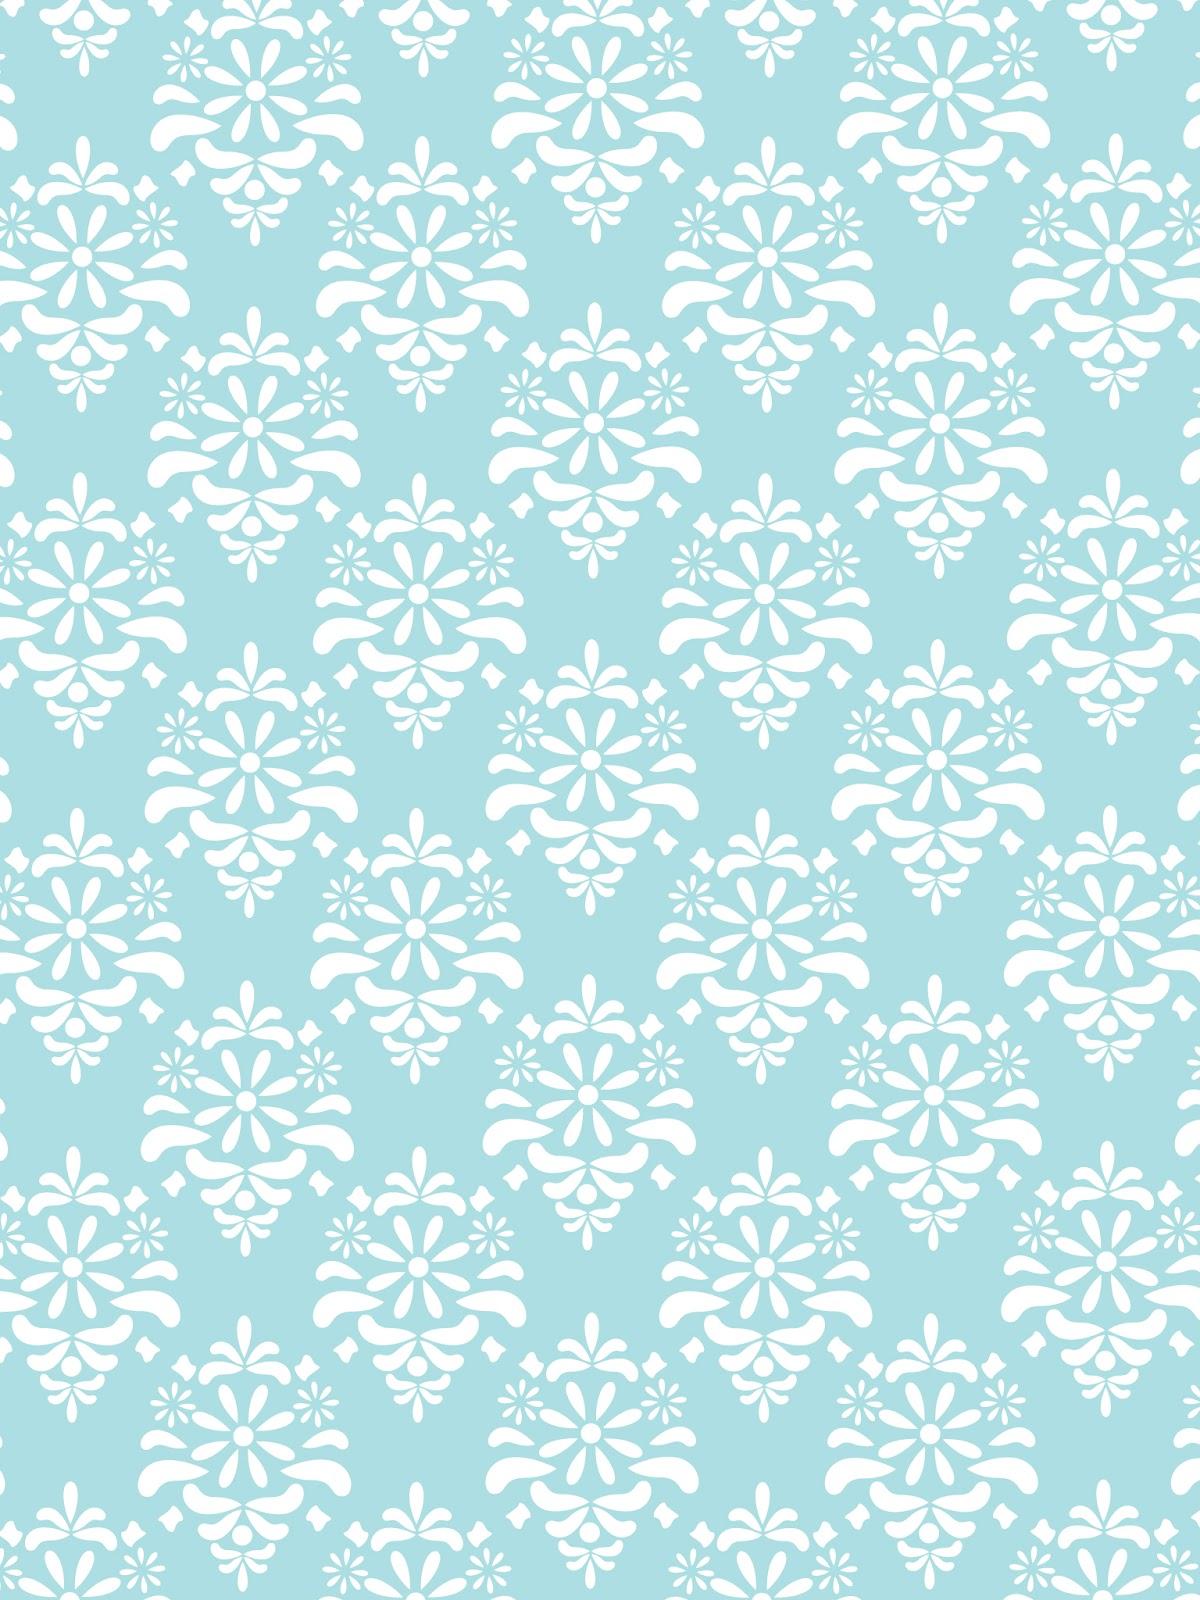 julesoca blog: Damask Wallpaper....Light Blue, Gray, Pink ...